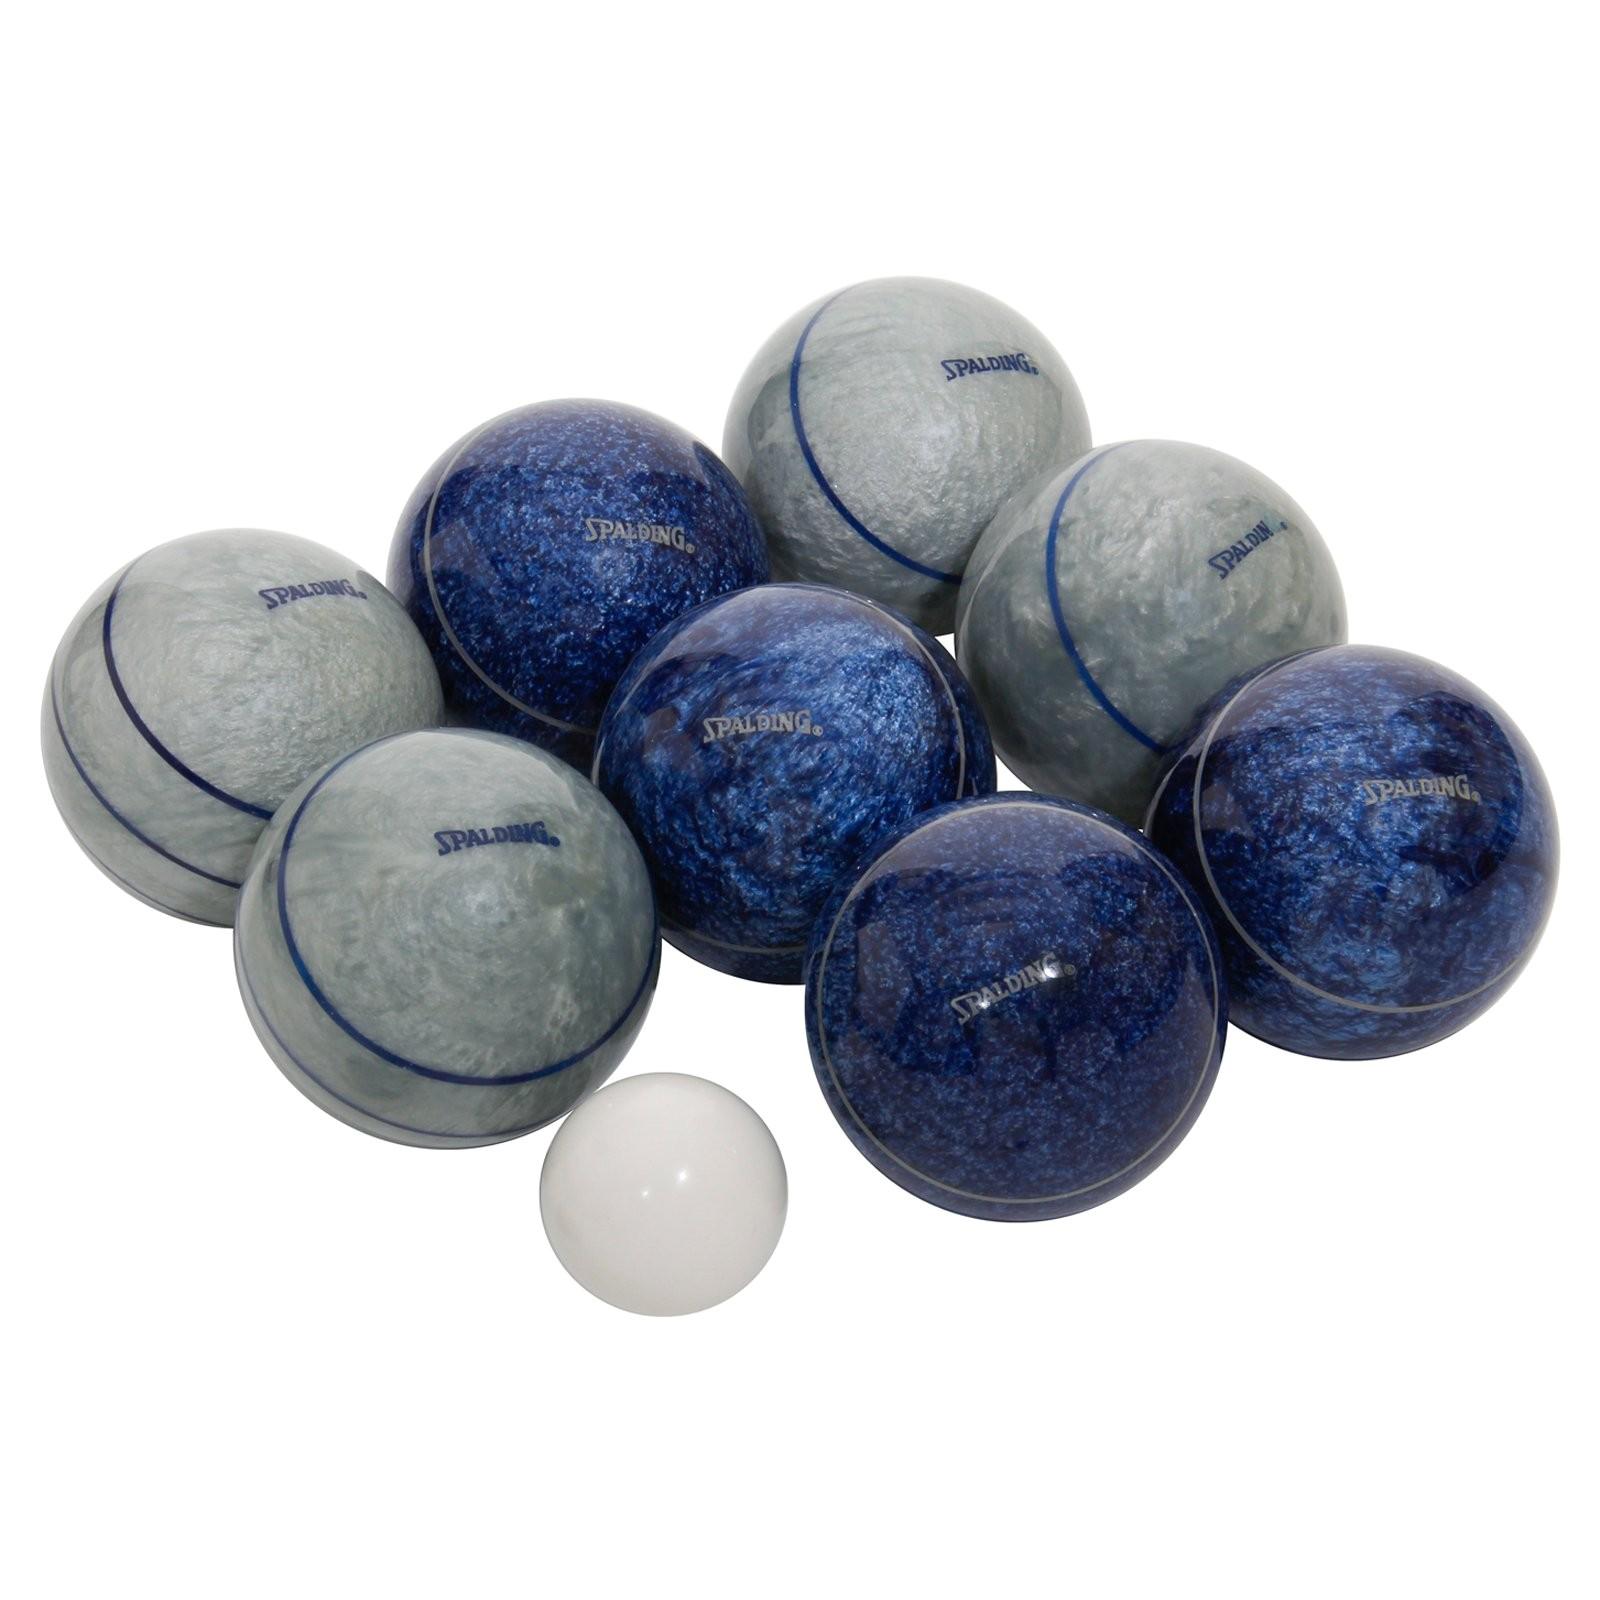 Professional Bocce Ball Set Spalding Professional Series 107mm Bocce Ball Set Bocce